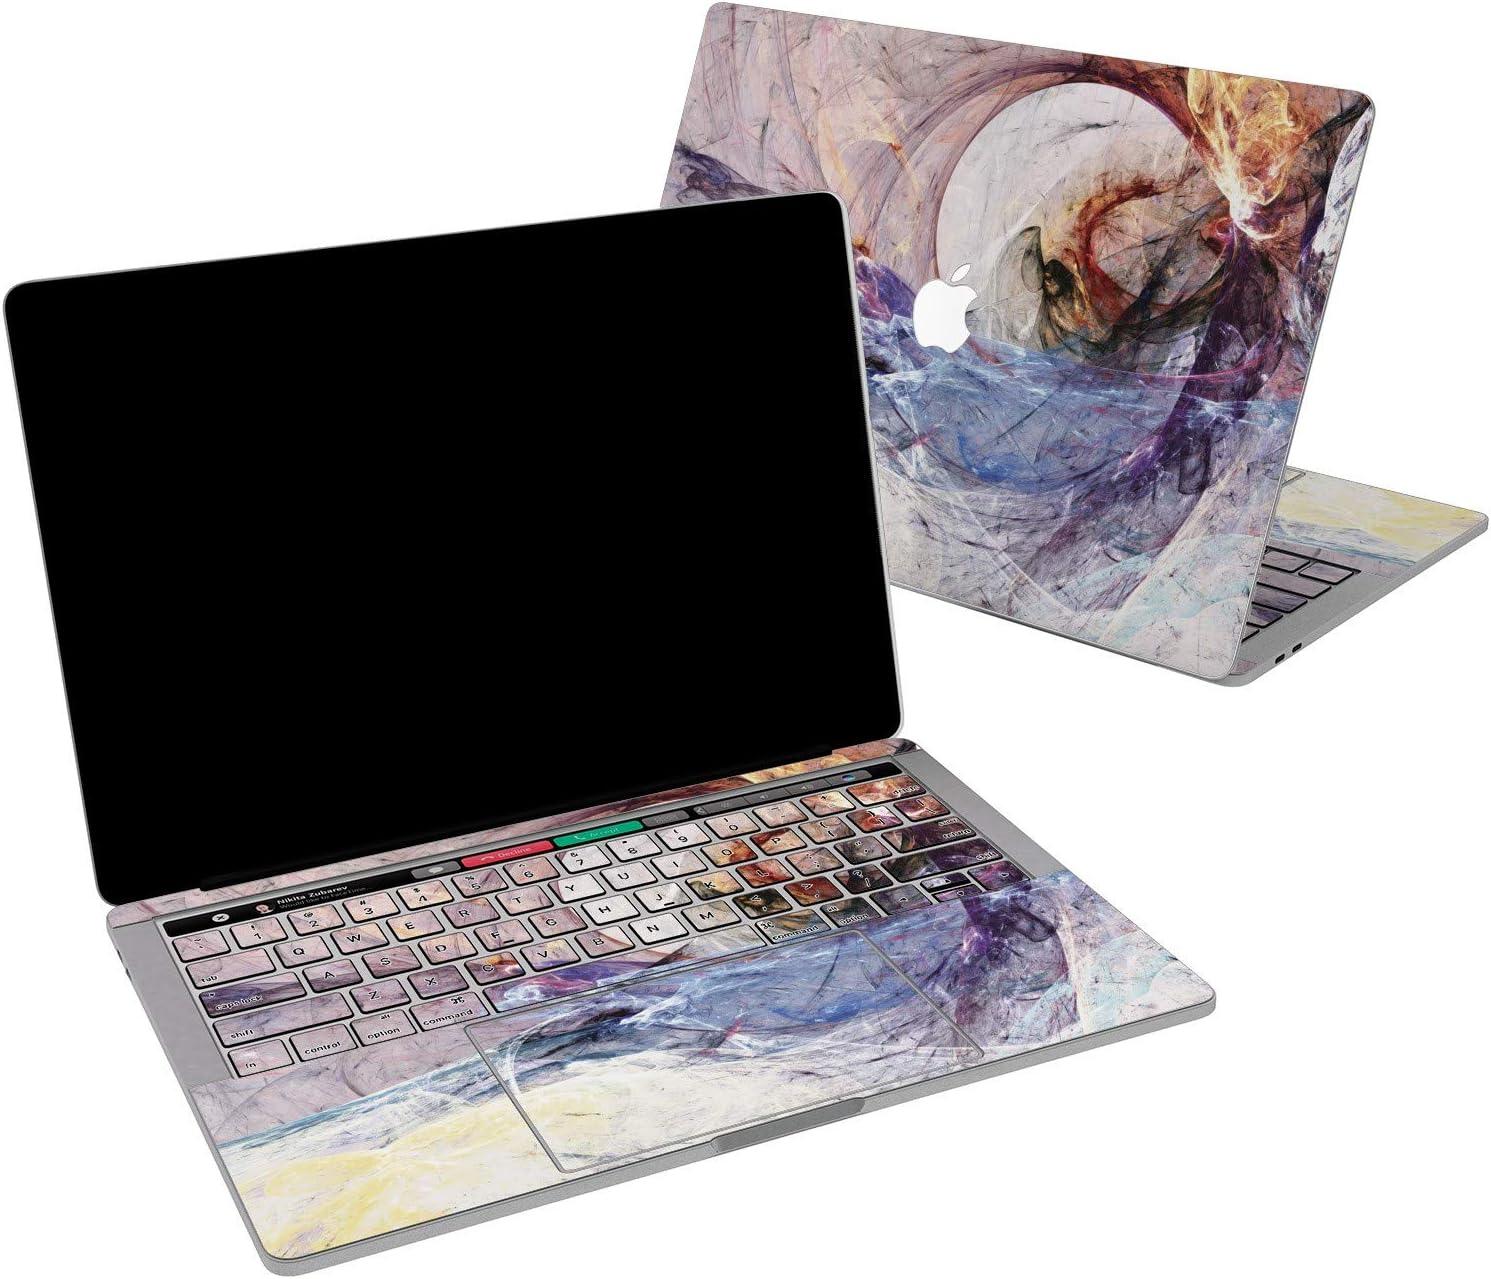 Lex Altern Vinyl Skin for MacBook Air 13 inch Mac Pro 16 15 Retina 12 11 2020 2019 2018 2017 Abstract Wave Paint Art Fire Luxury Swirl Modern Cover Keyboard Decal Sticker Touch Bar Laptop Women